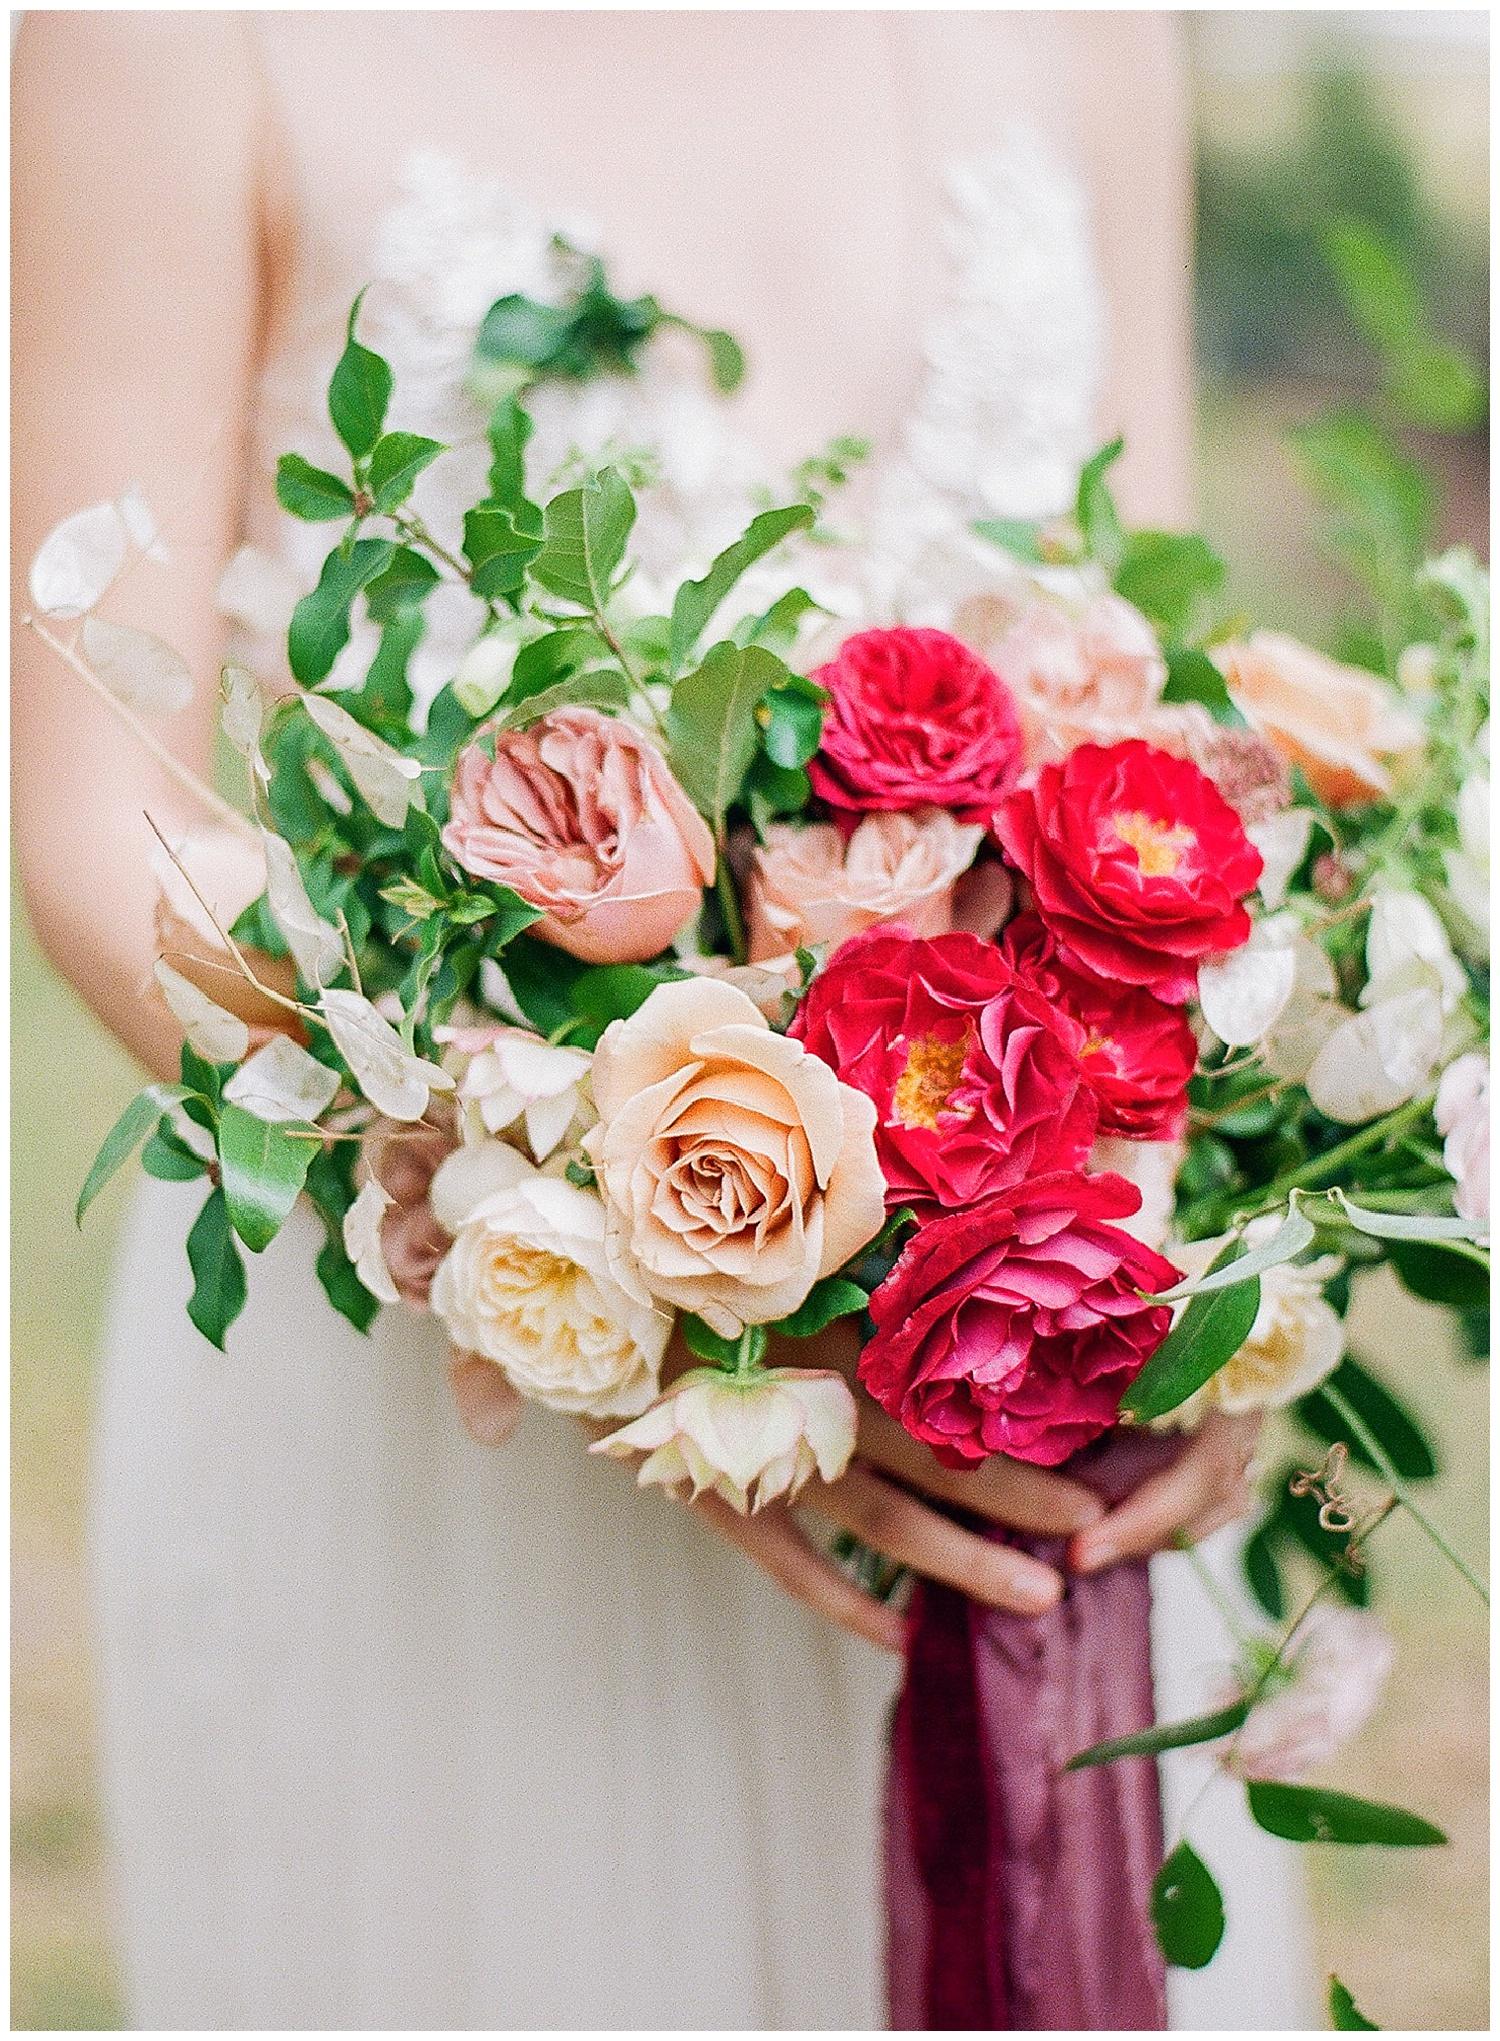 Charleston_Wedding_Janine_Licare_Photography_East_Made_Event_Company_0020.jpg